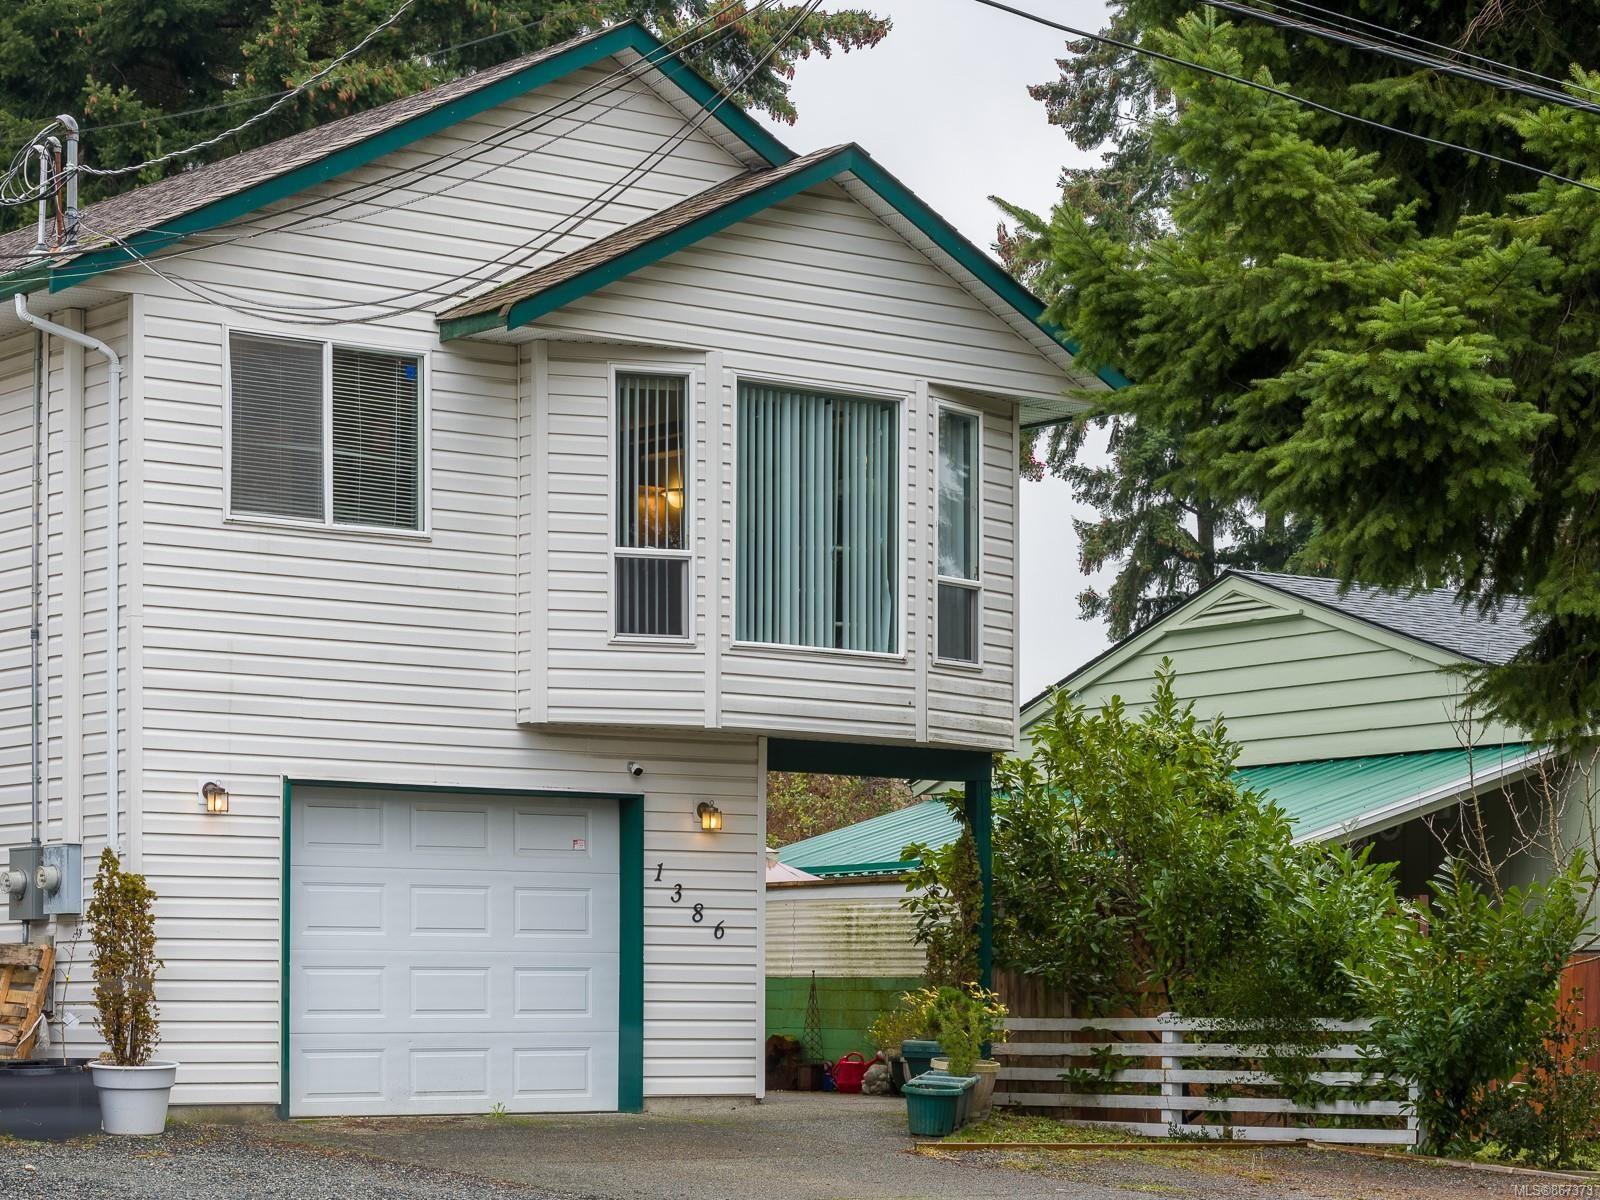 Main Photo: 1386 Graham Cres in : Na Central Nanaimo House for sale (Nanaimo)  : MLS®# 867373